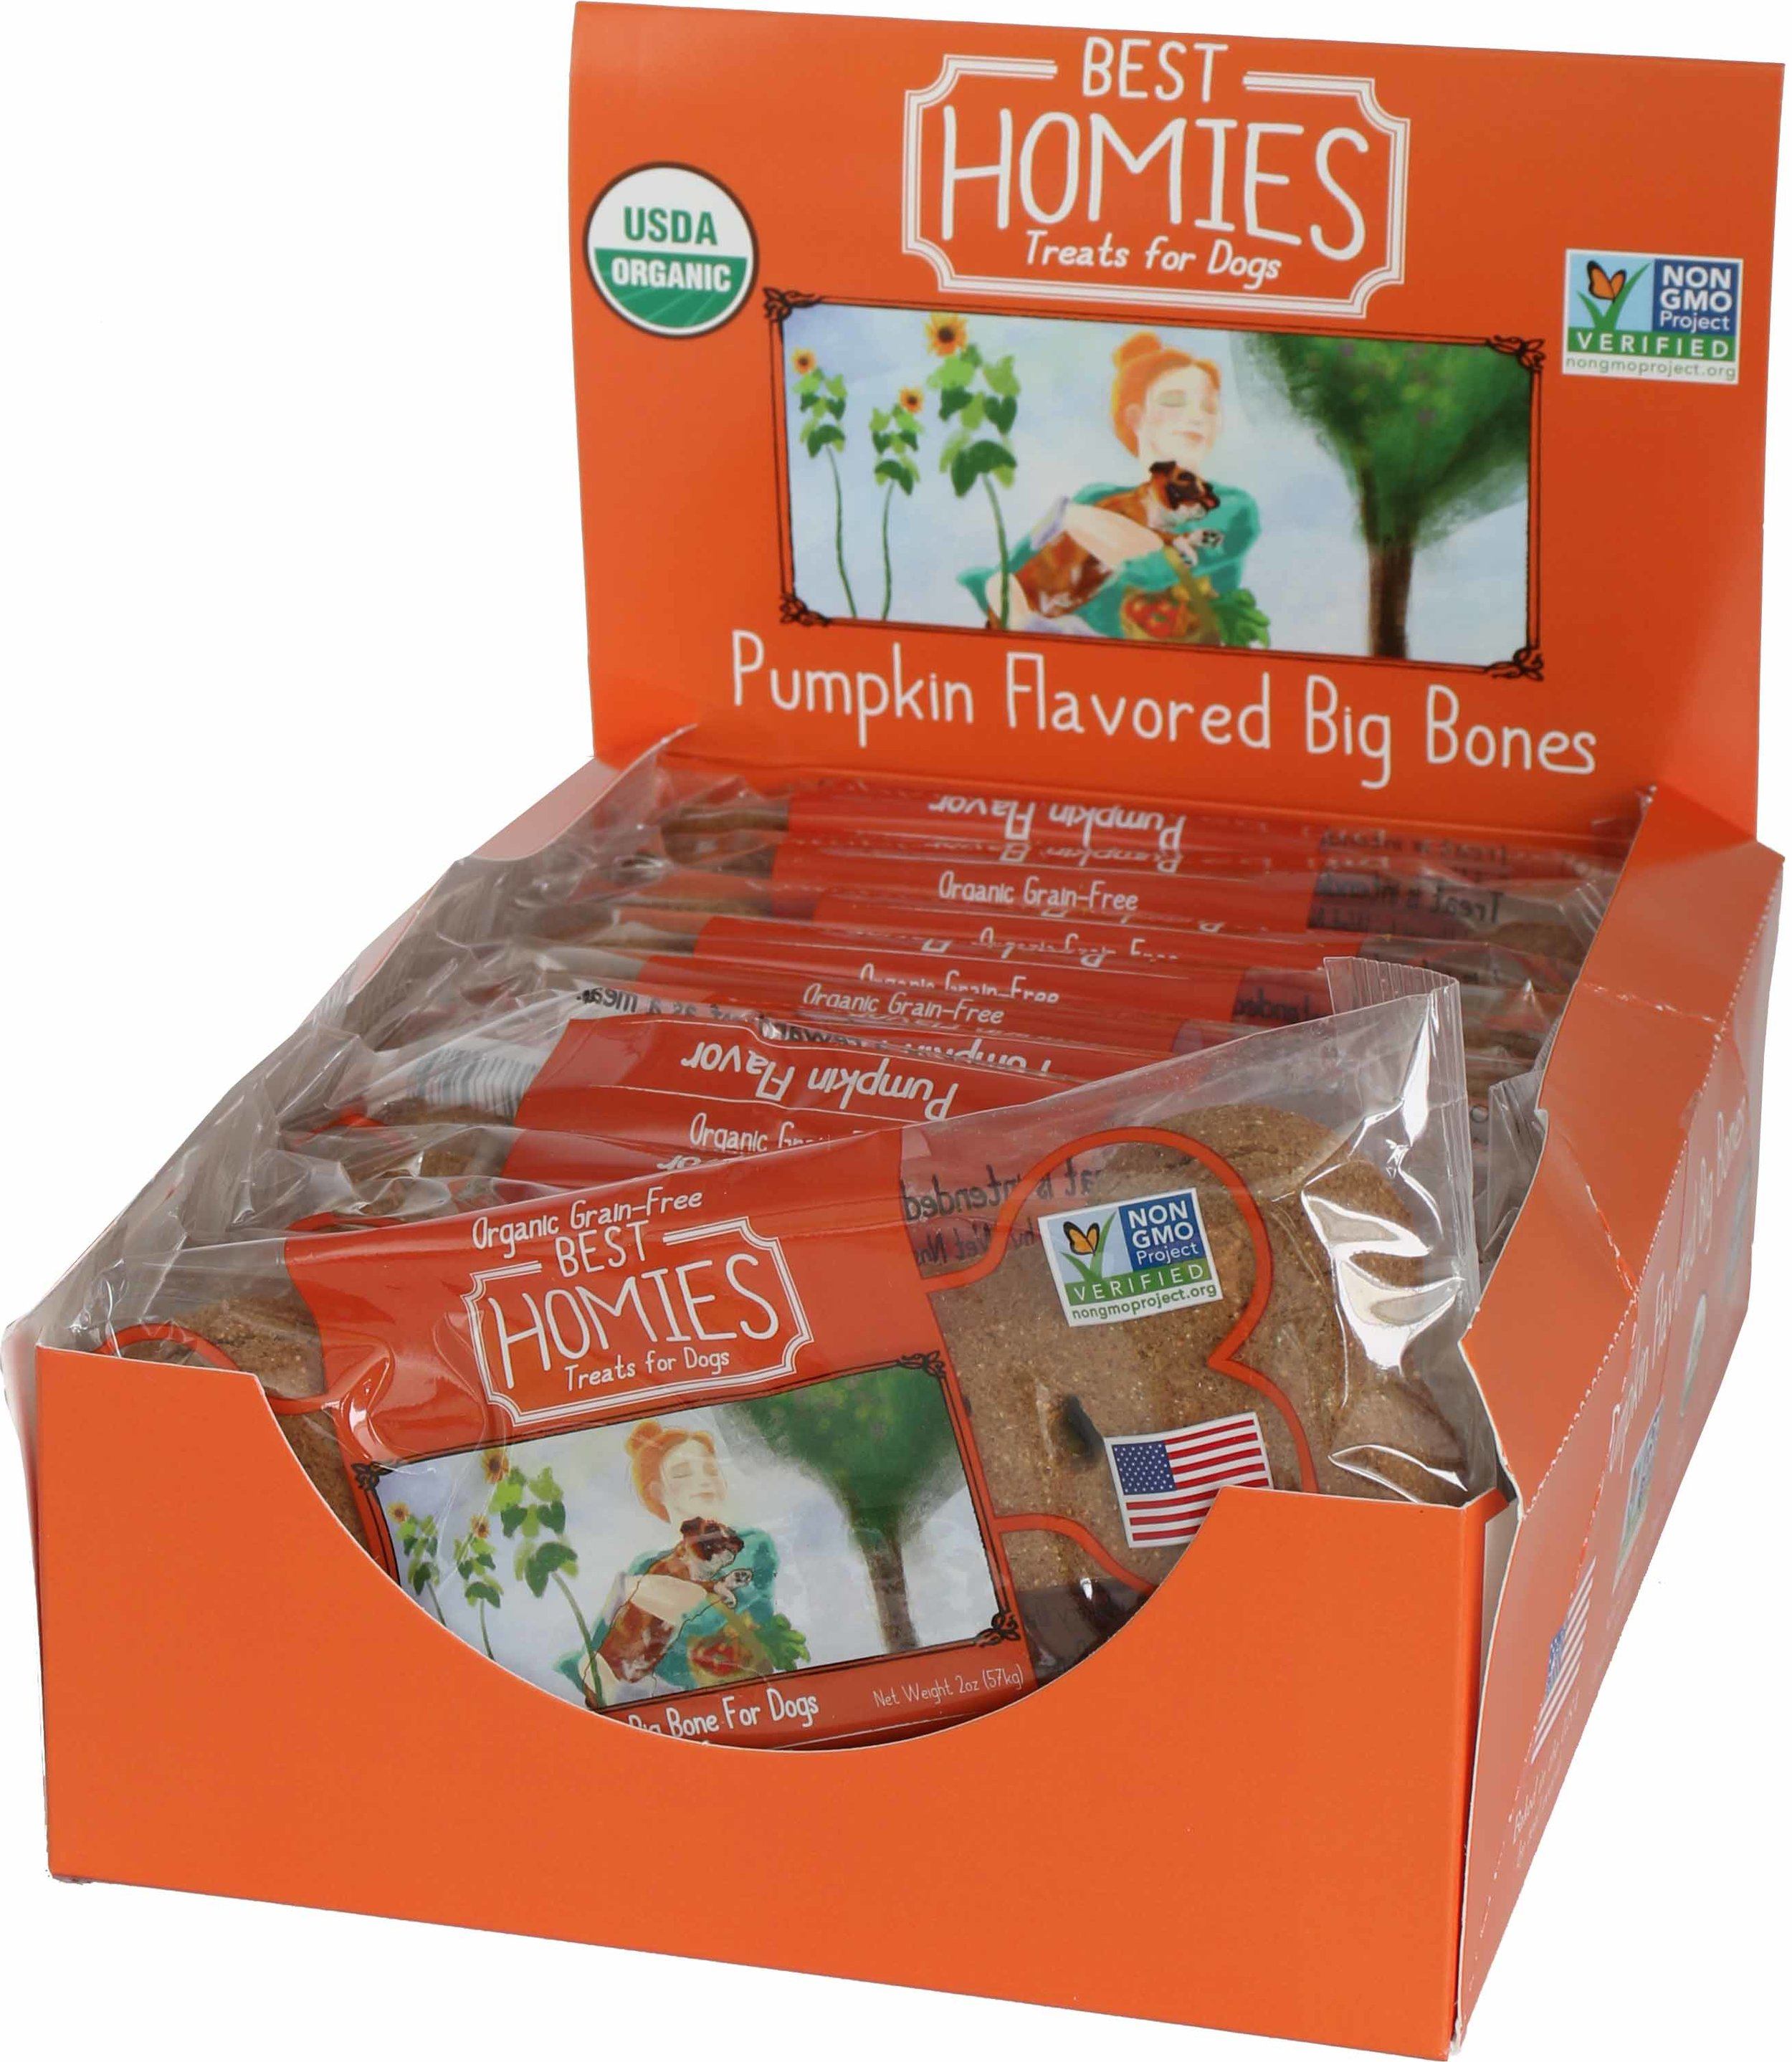 BH Pumpkin BB in Holder - Transparent copy.jpg